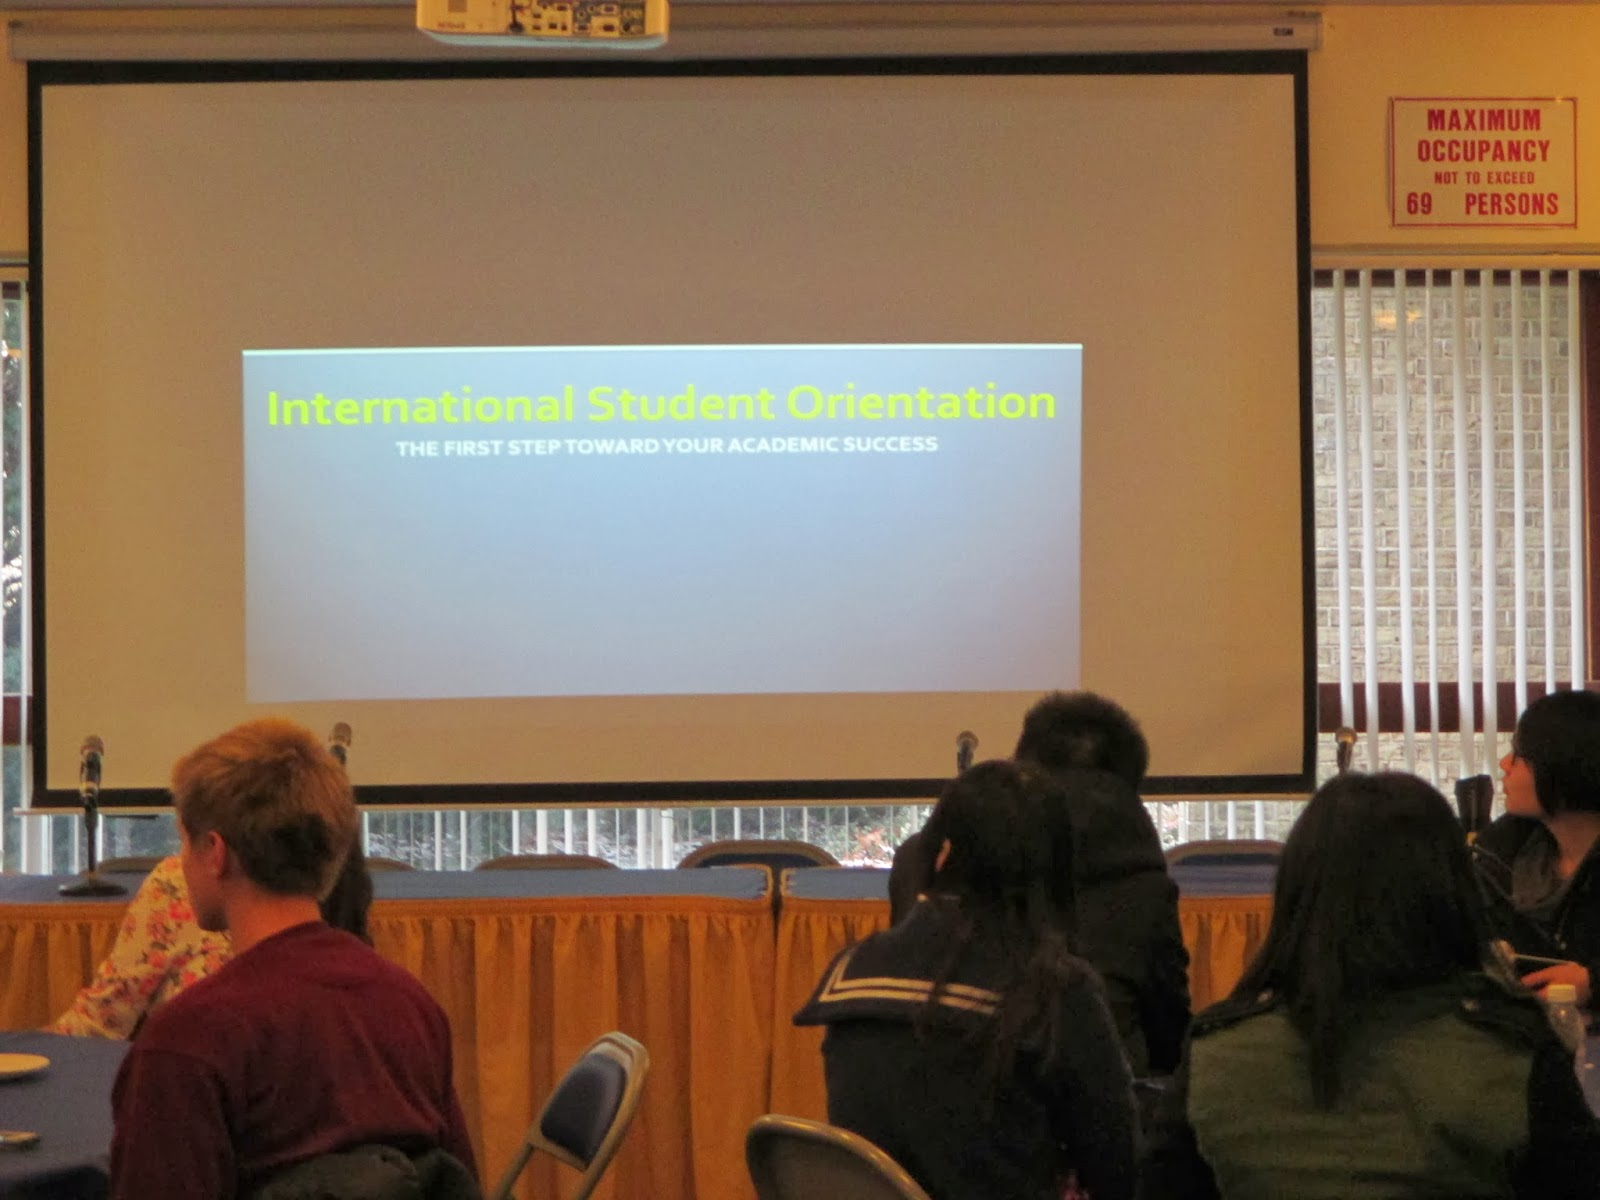 Hofstra Student Life: International Student Orientation